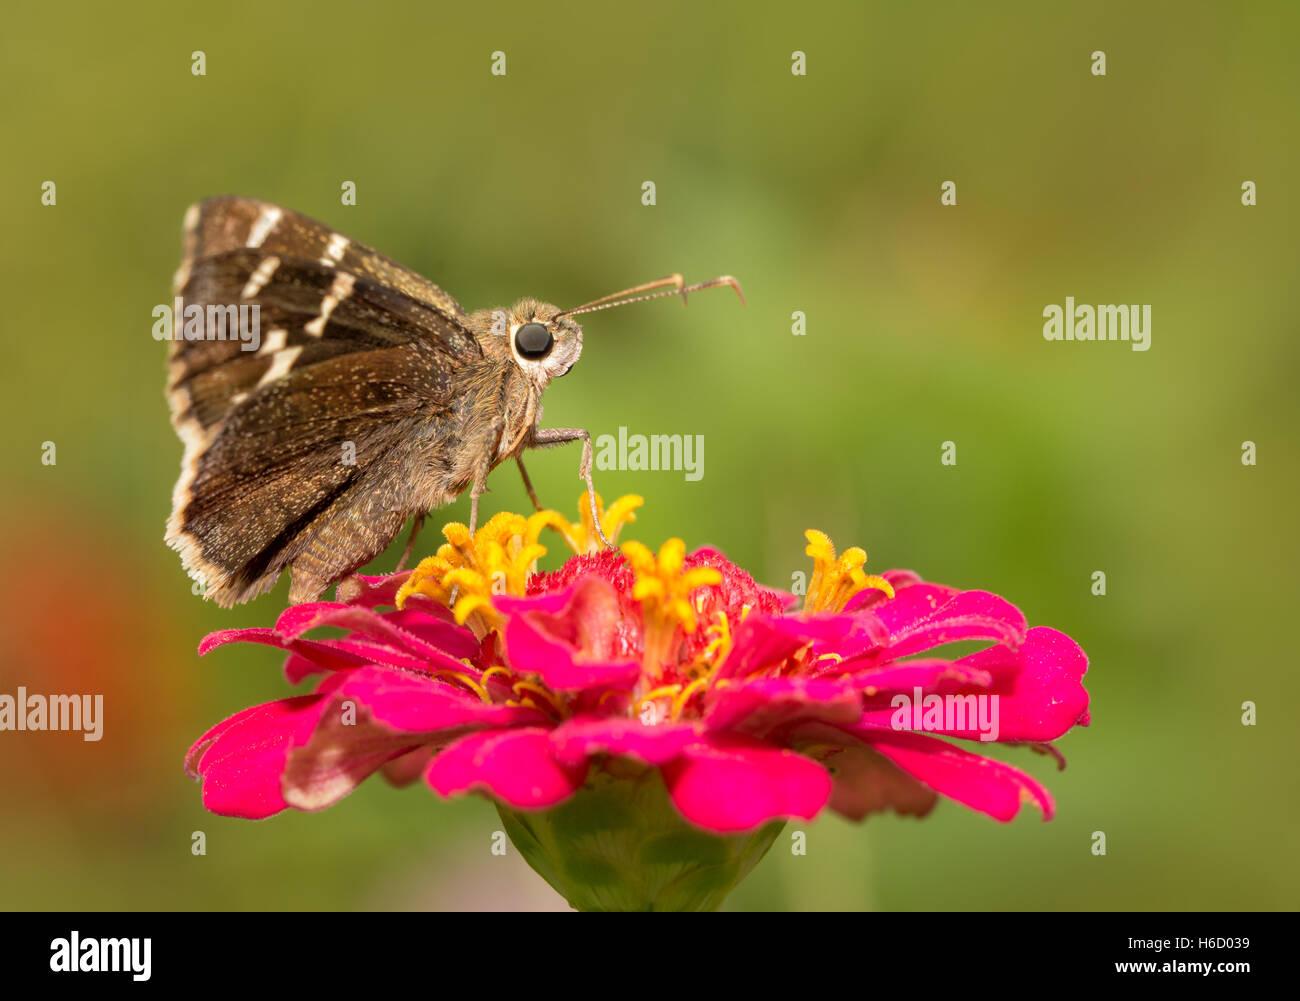 Mariposa Cloudywing sur descansa sobre un hot pink Zinnia flor Foto de stock